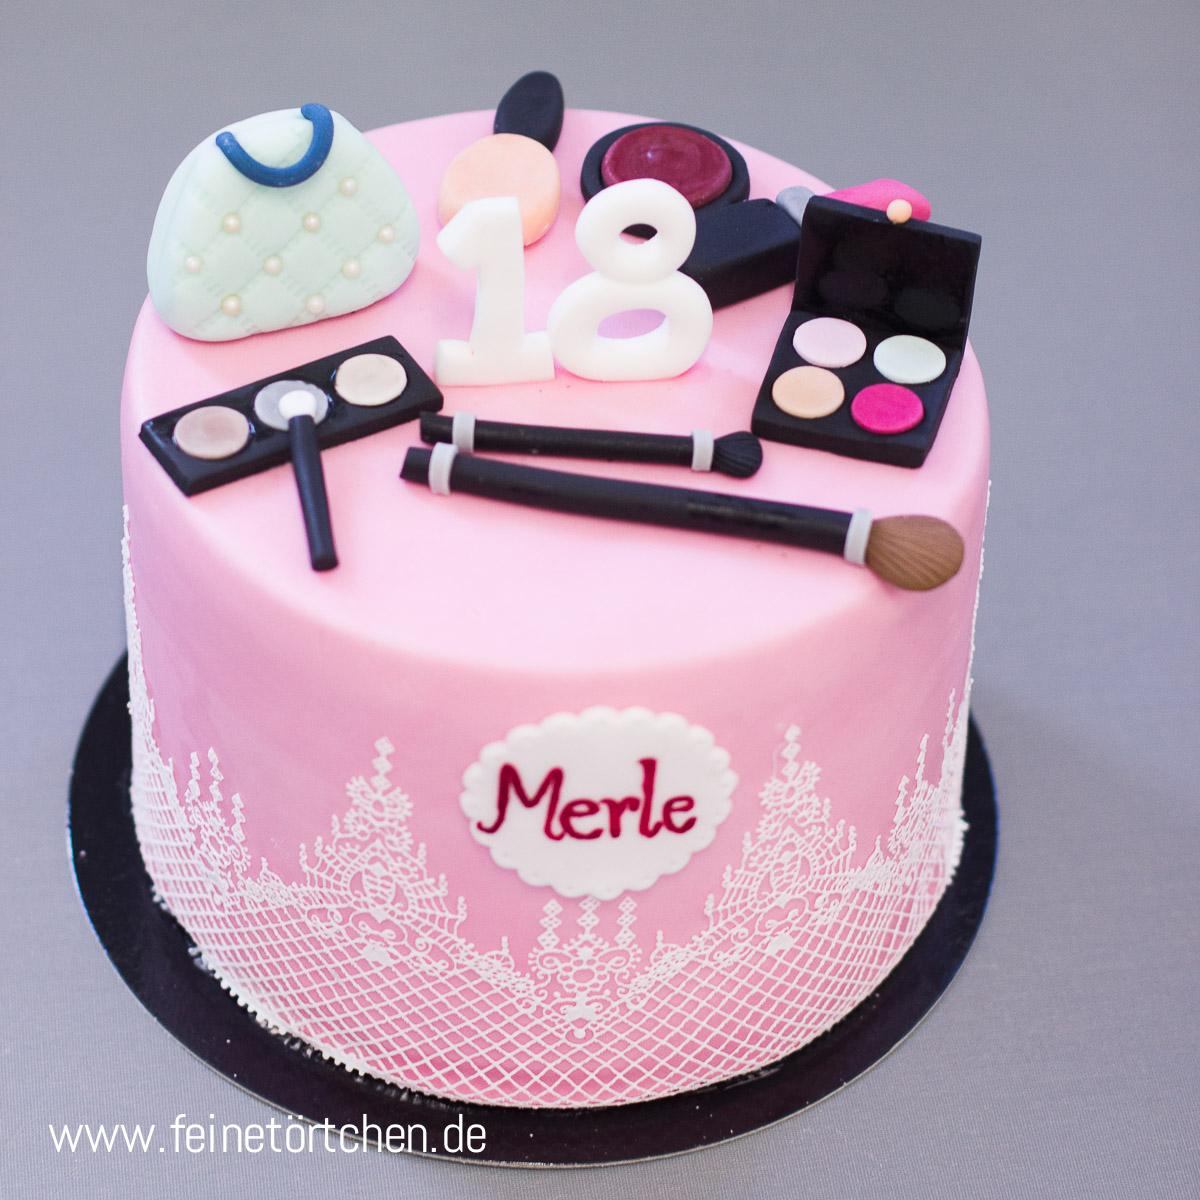 Make Up Torte Mademoiselle Cupcake Webshop